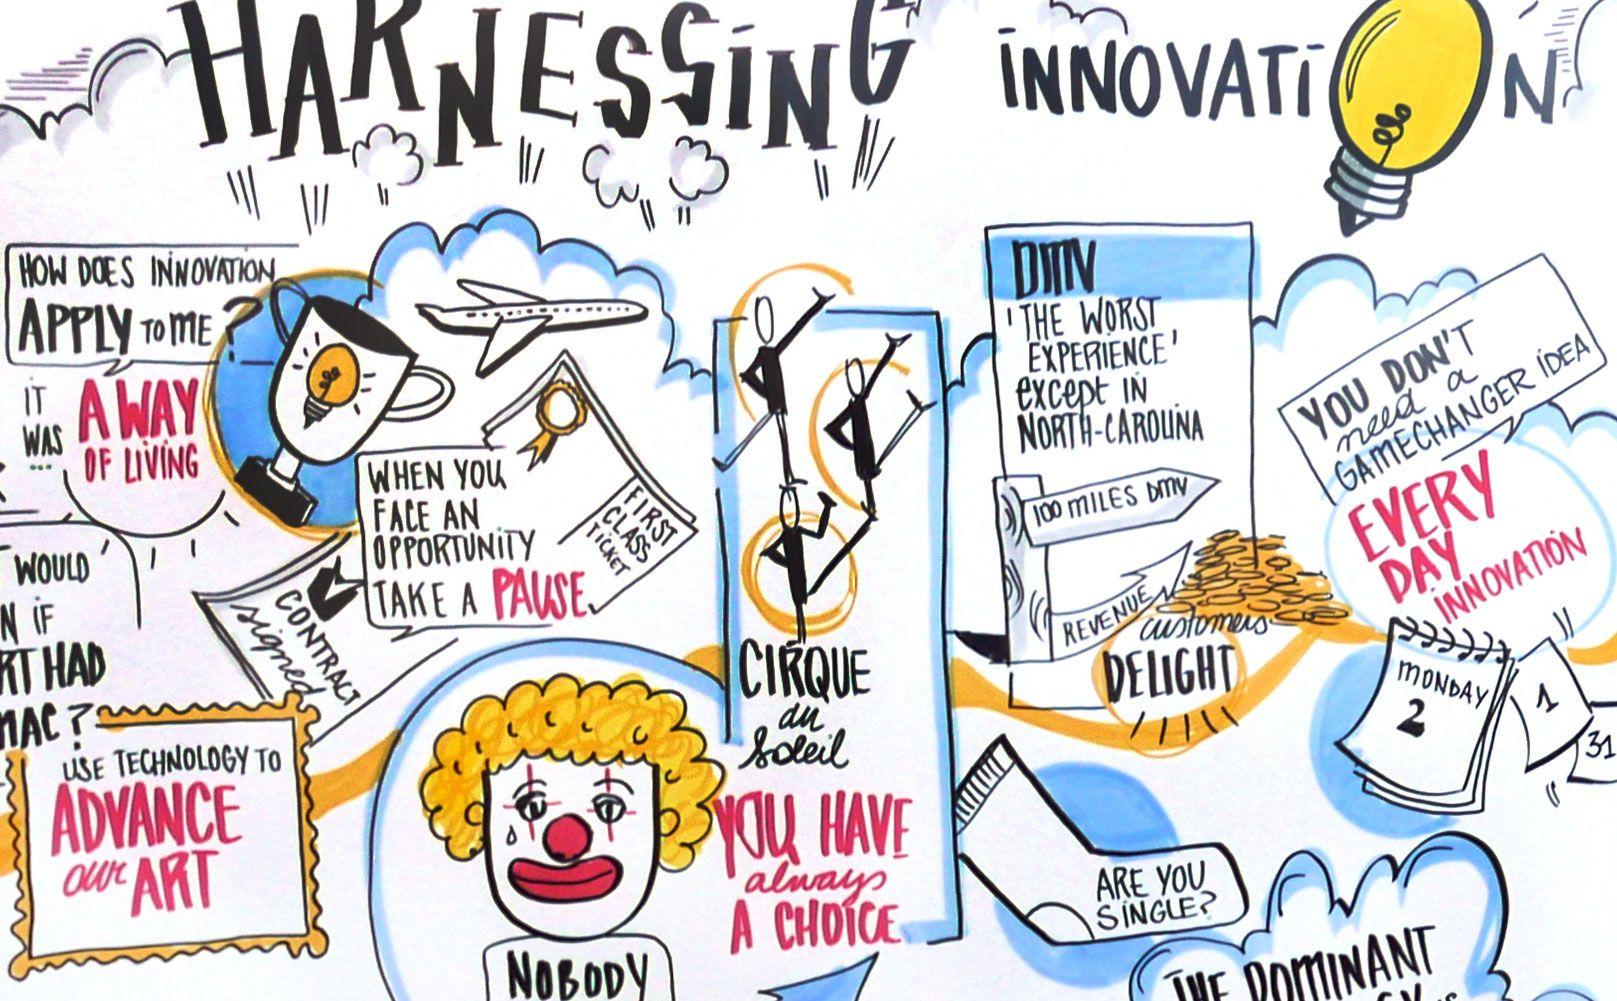 Inside Gartner Digital Marketing Conference 2017 Marketing